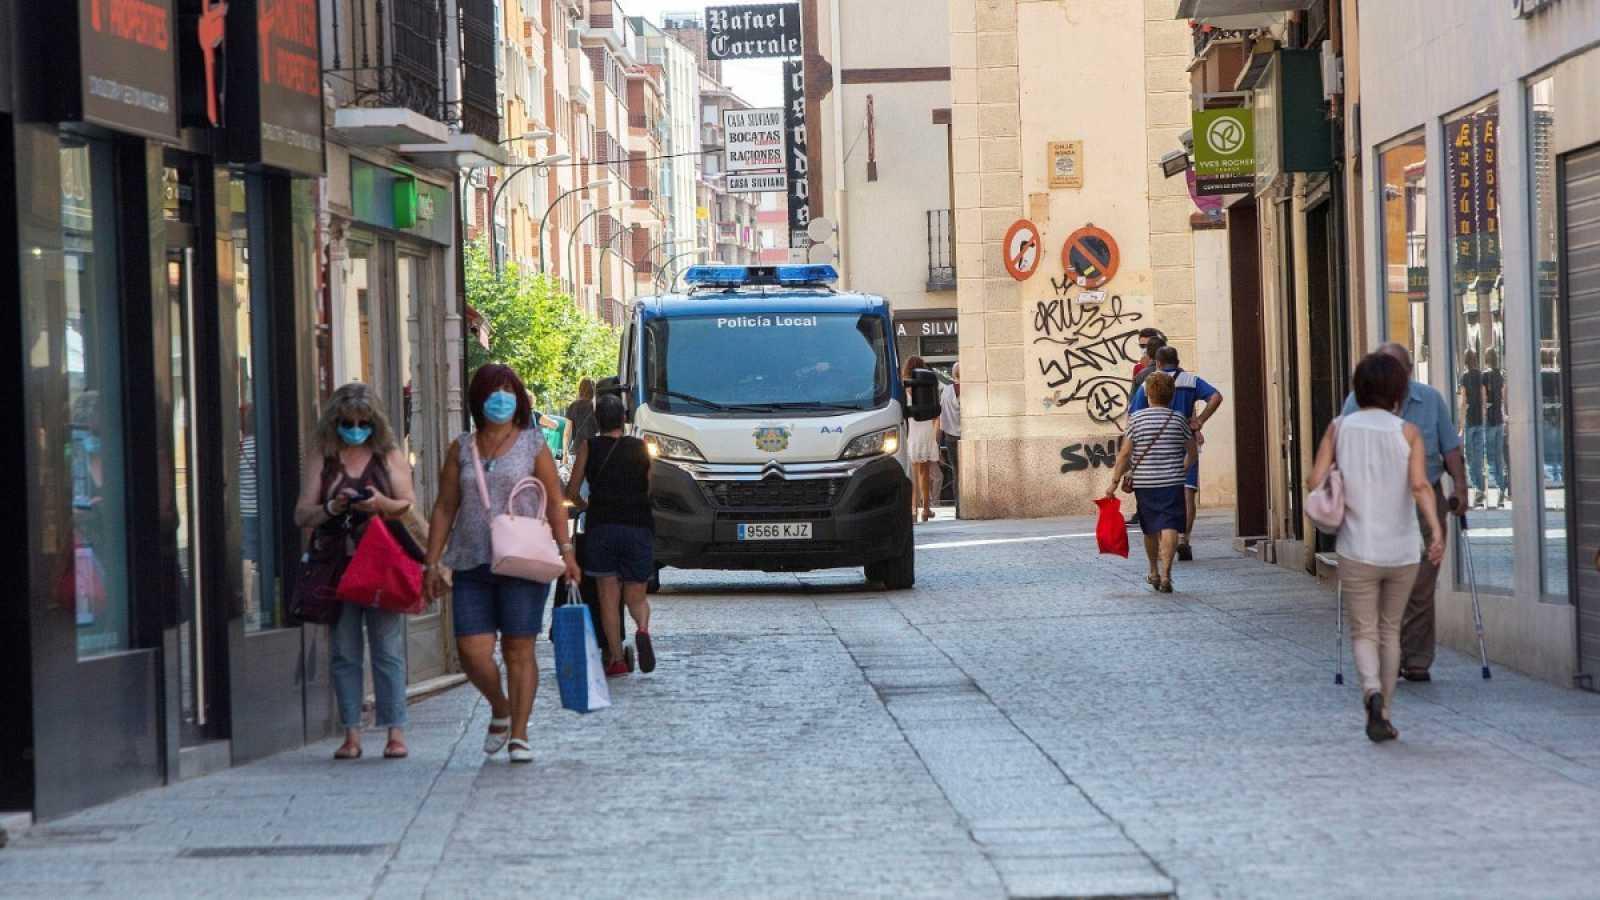 Un coche de policía circula por las calles de Aranda de Duero (Burgos)